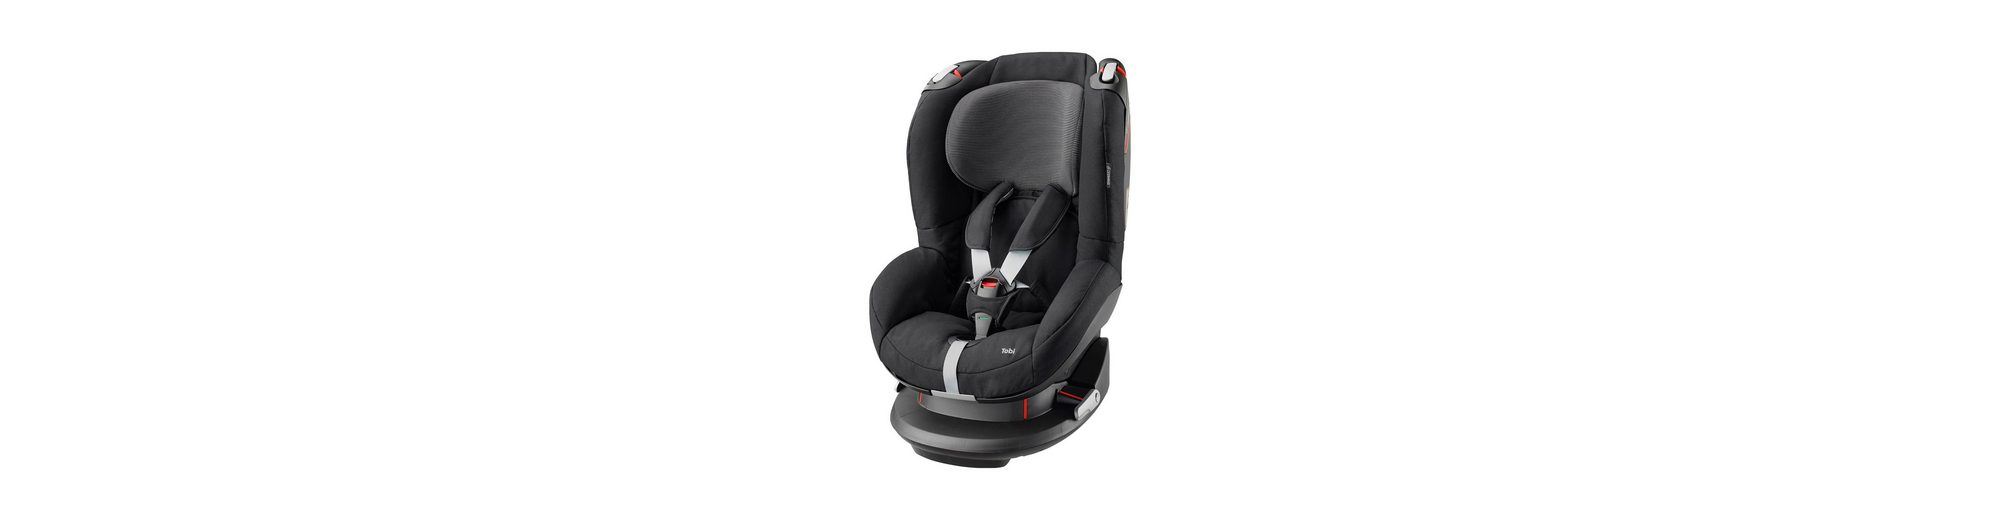 MAXI-COSI Kindersitz Design 2016